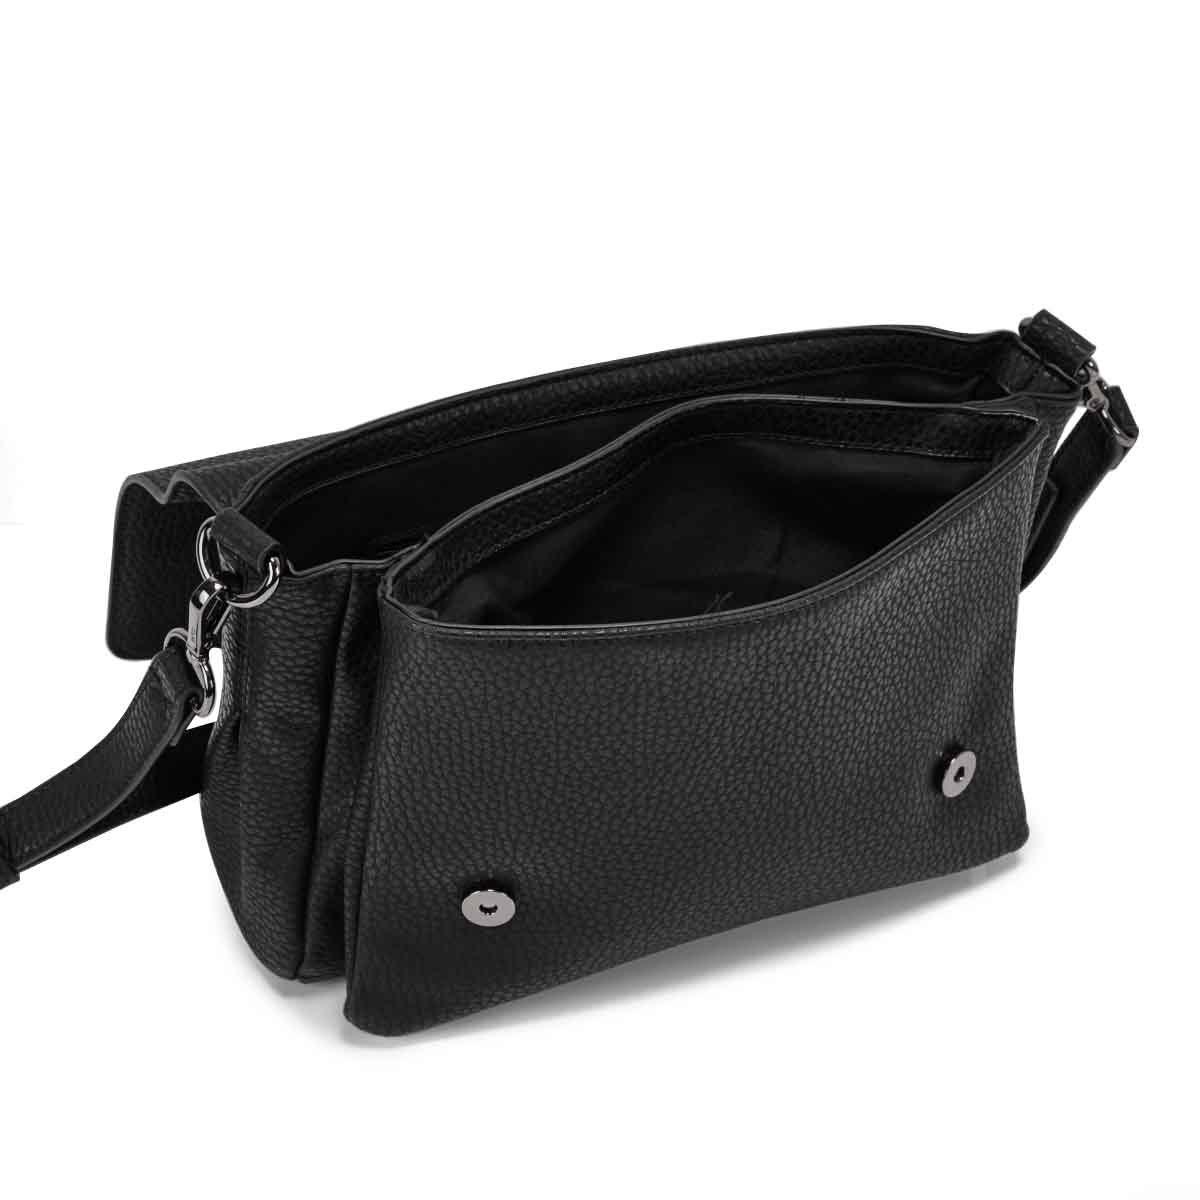 Lds black messenger crossbody bag